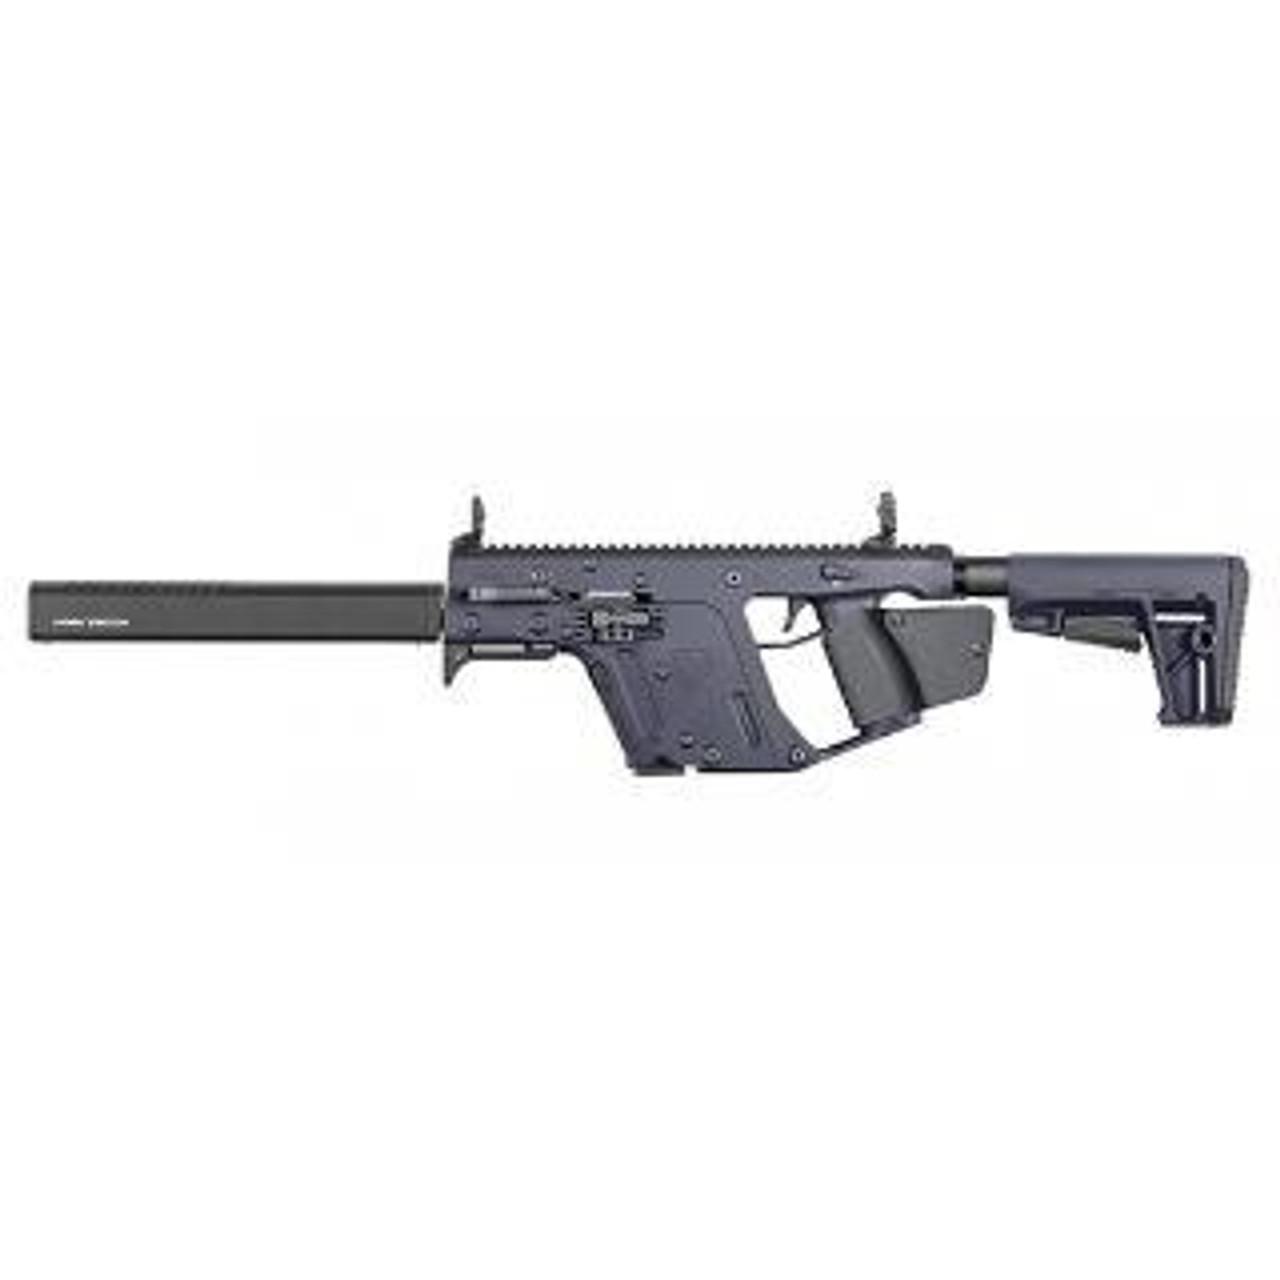 Kriss Vector - Combat Gray - Factory California Legal - 10mm